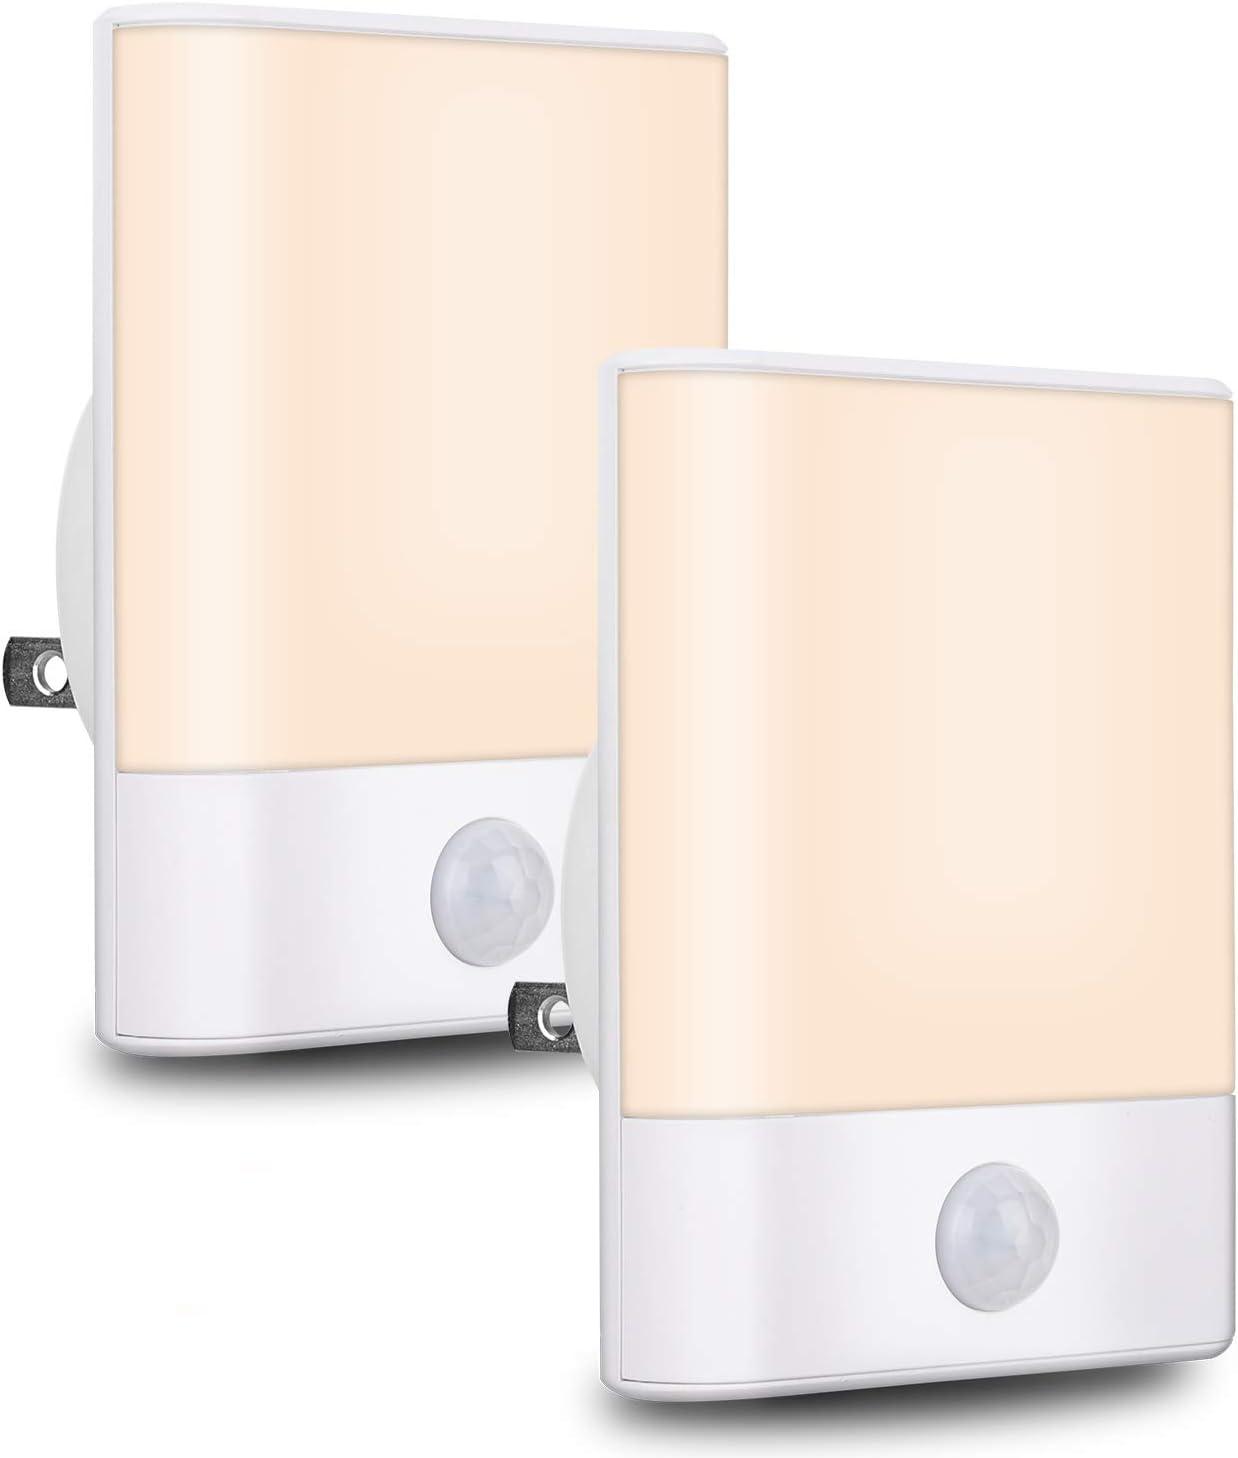 LED Night Light,BriVIVI Motion Sensor Night Light with Adjustable Brightness 3 Lighting Mode AUTO/ON/Off for Children, Bedroom, Hallway Light, 2 Pack